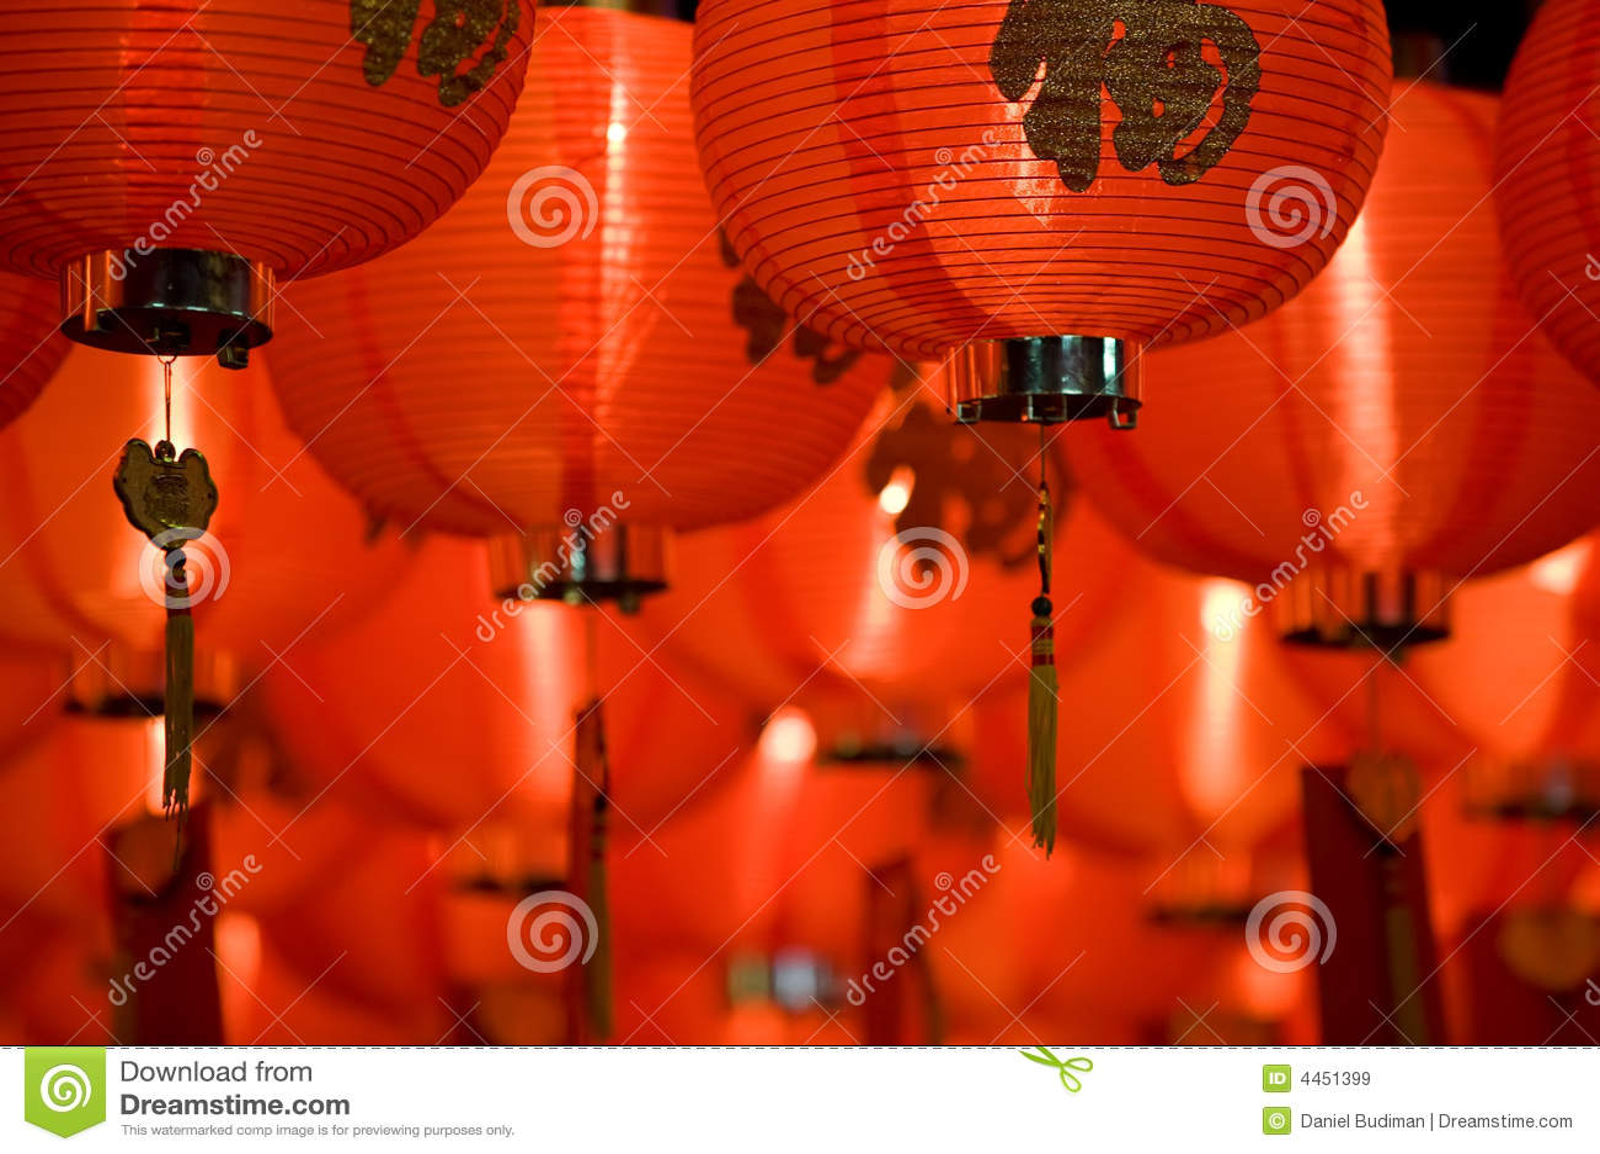 Chinese paper lantern close up